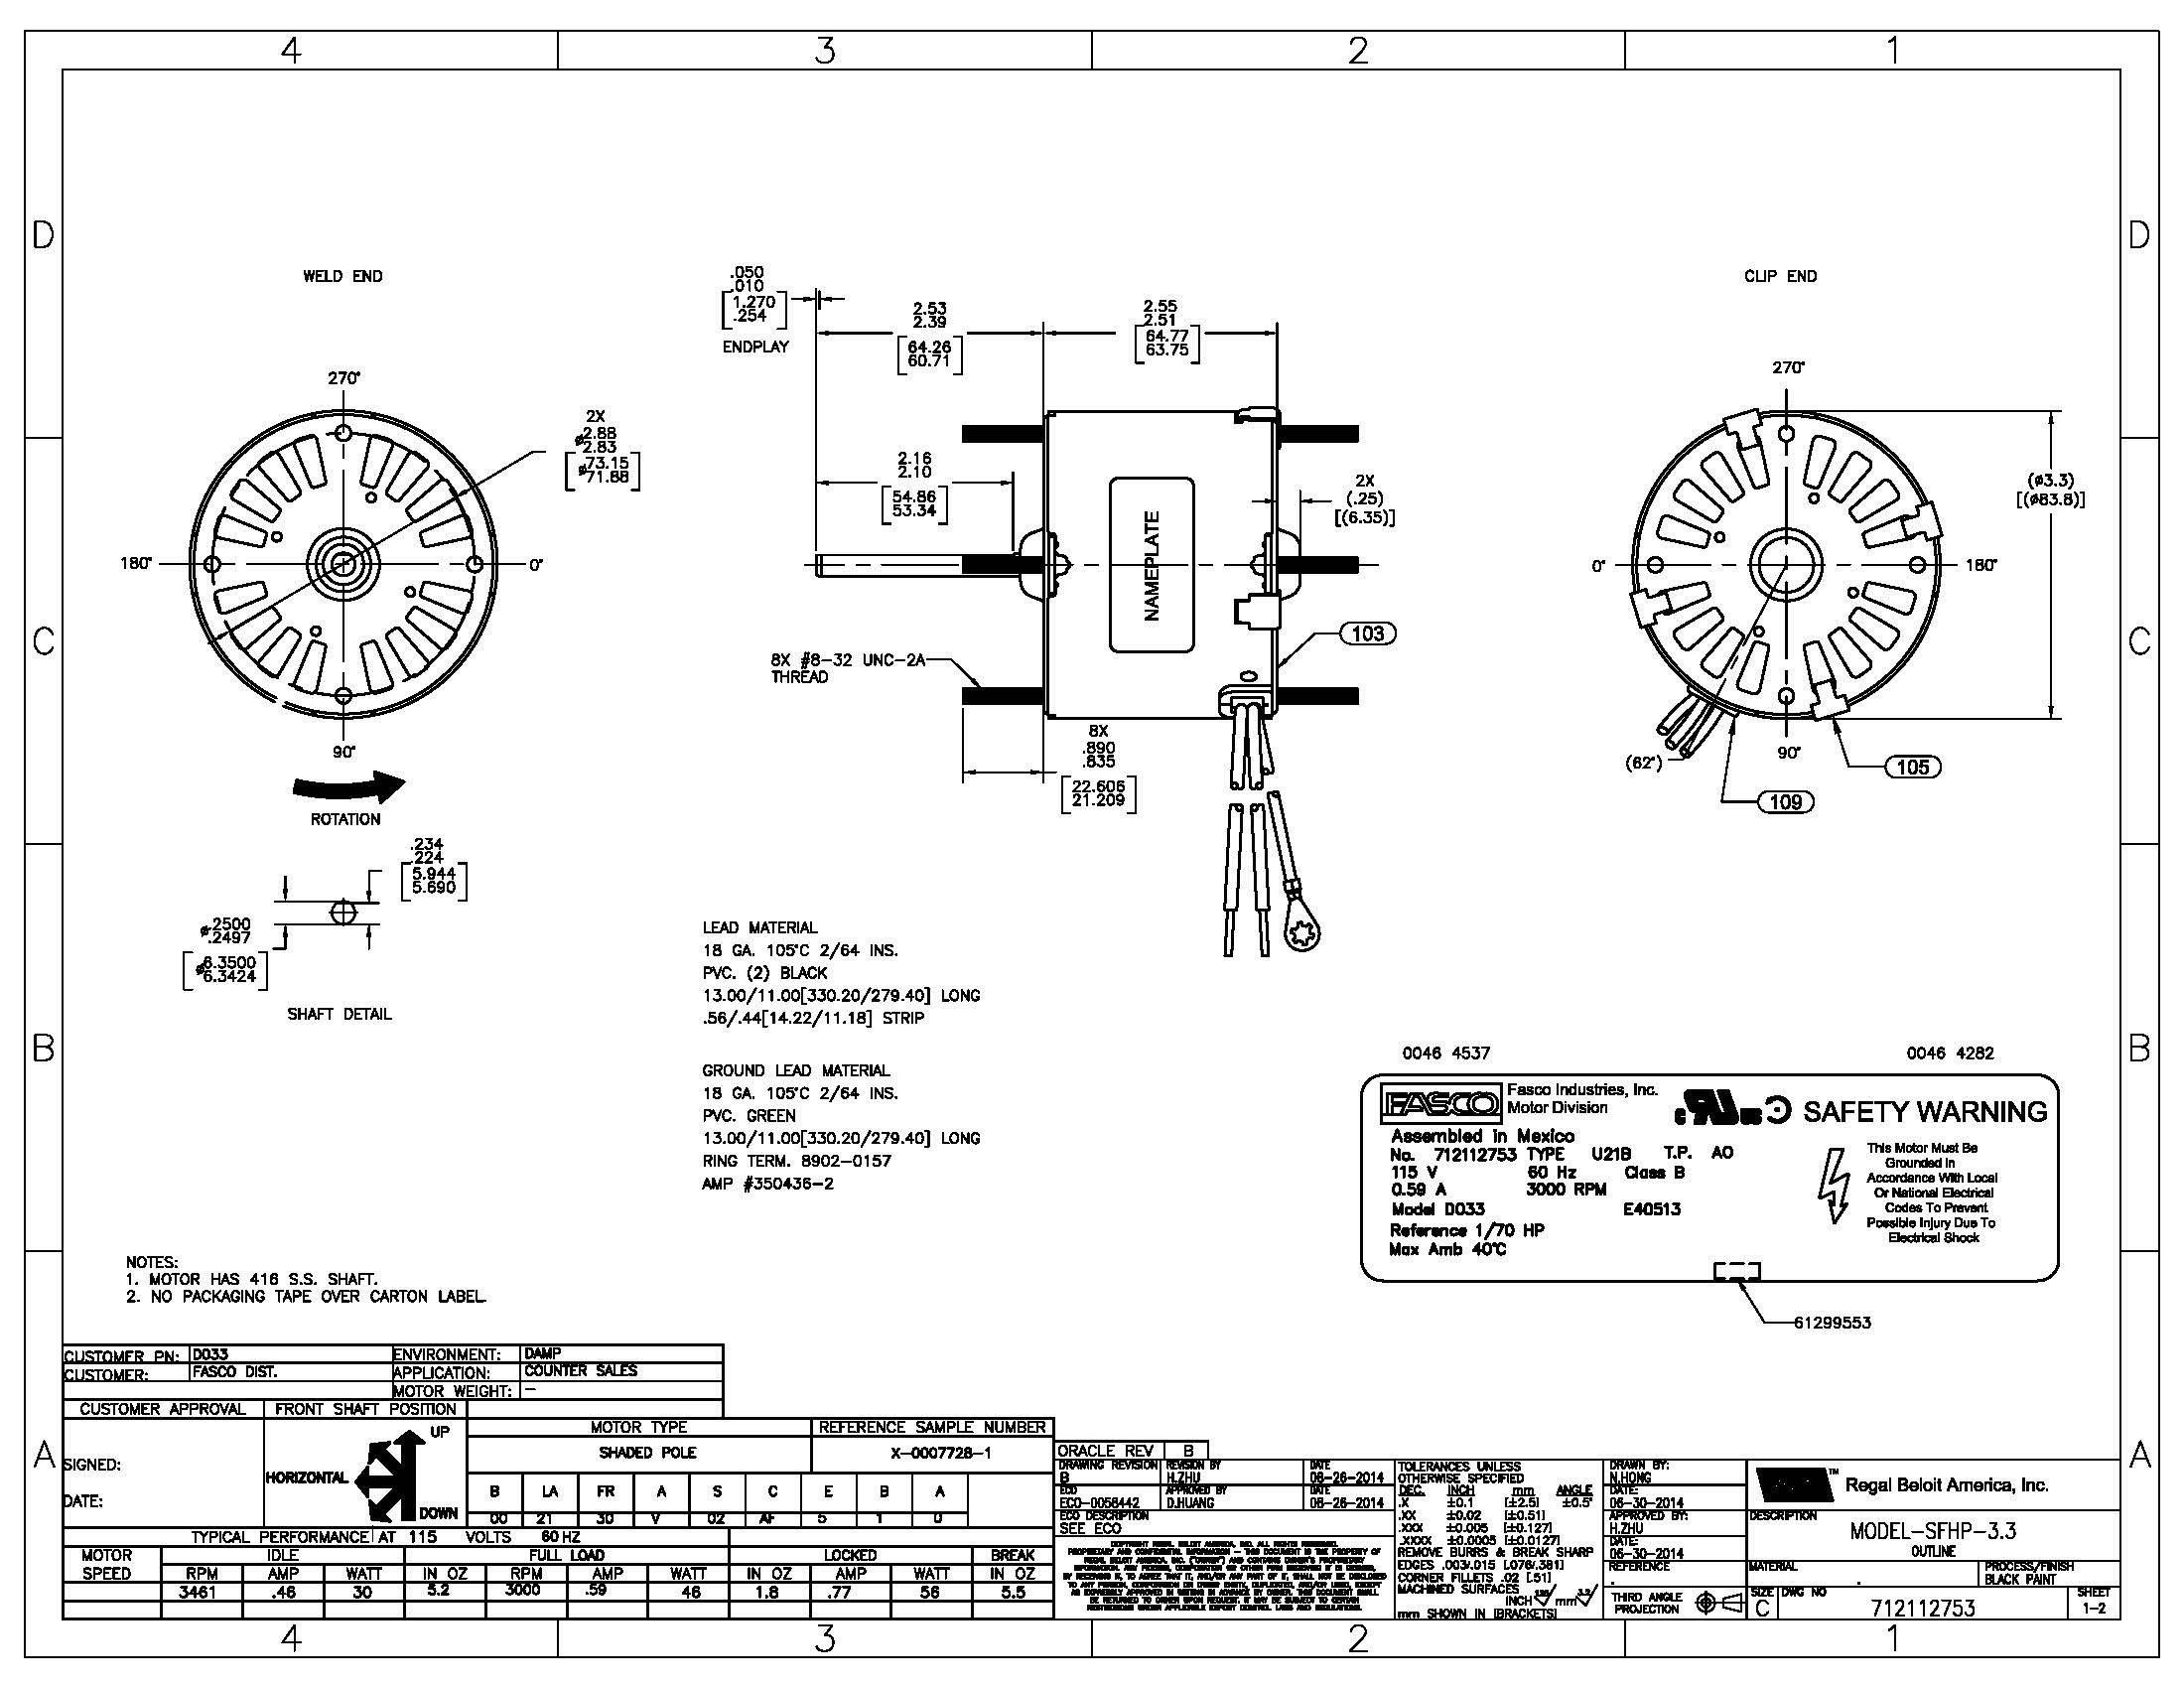 Condenser Fan Motor Wiring Diagram 9 Mapiraj New In | Philteg.in - 3 Wire Condenser Fan Motor Wiring Diagram